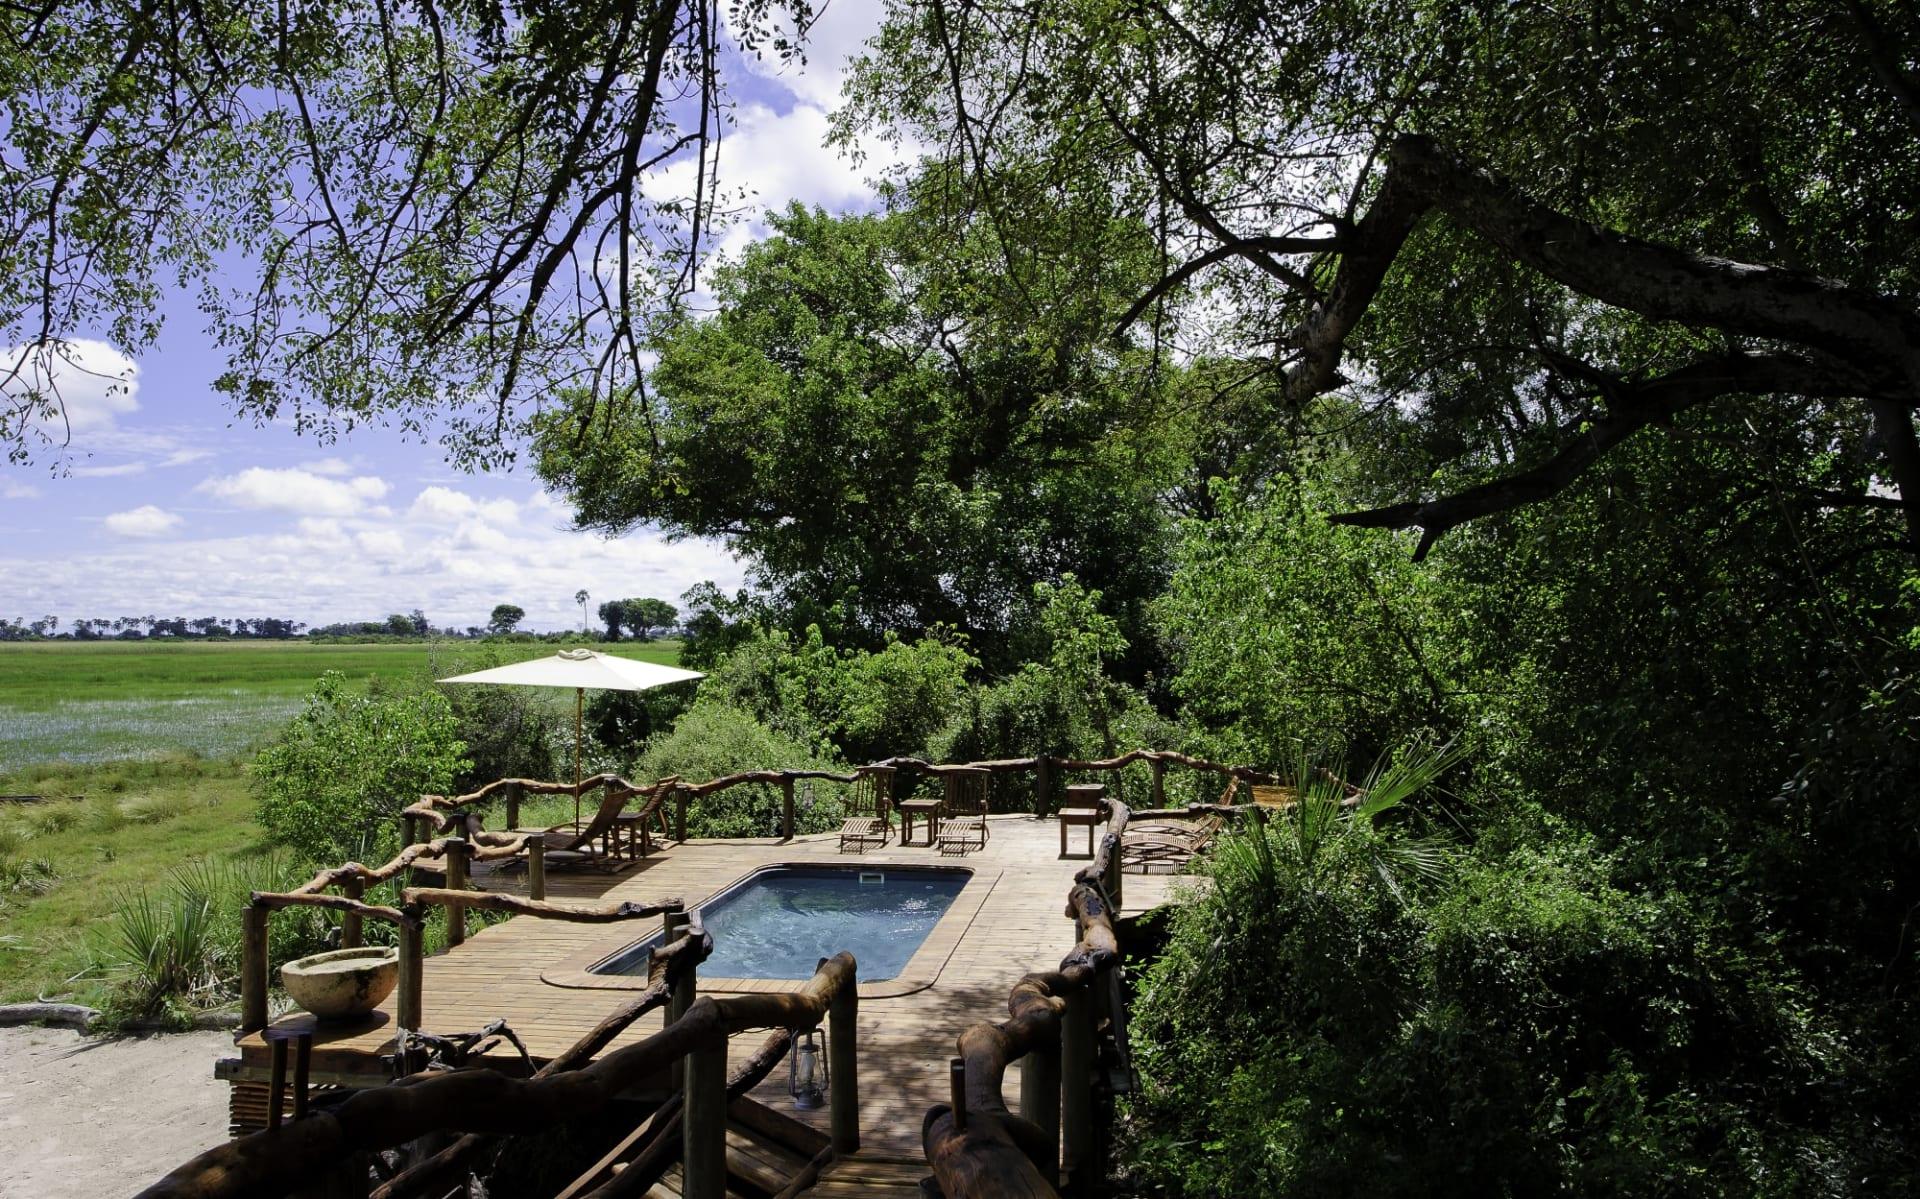 Tubu Tree Camp in Okavango Delta: Tubu Tree Camp